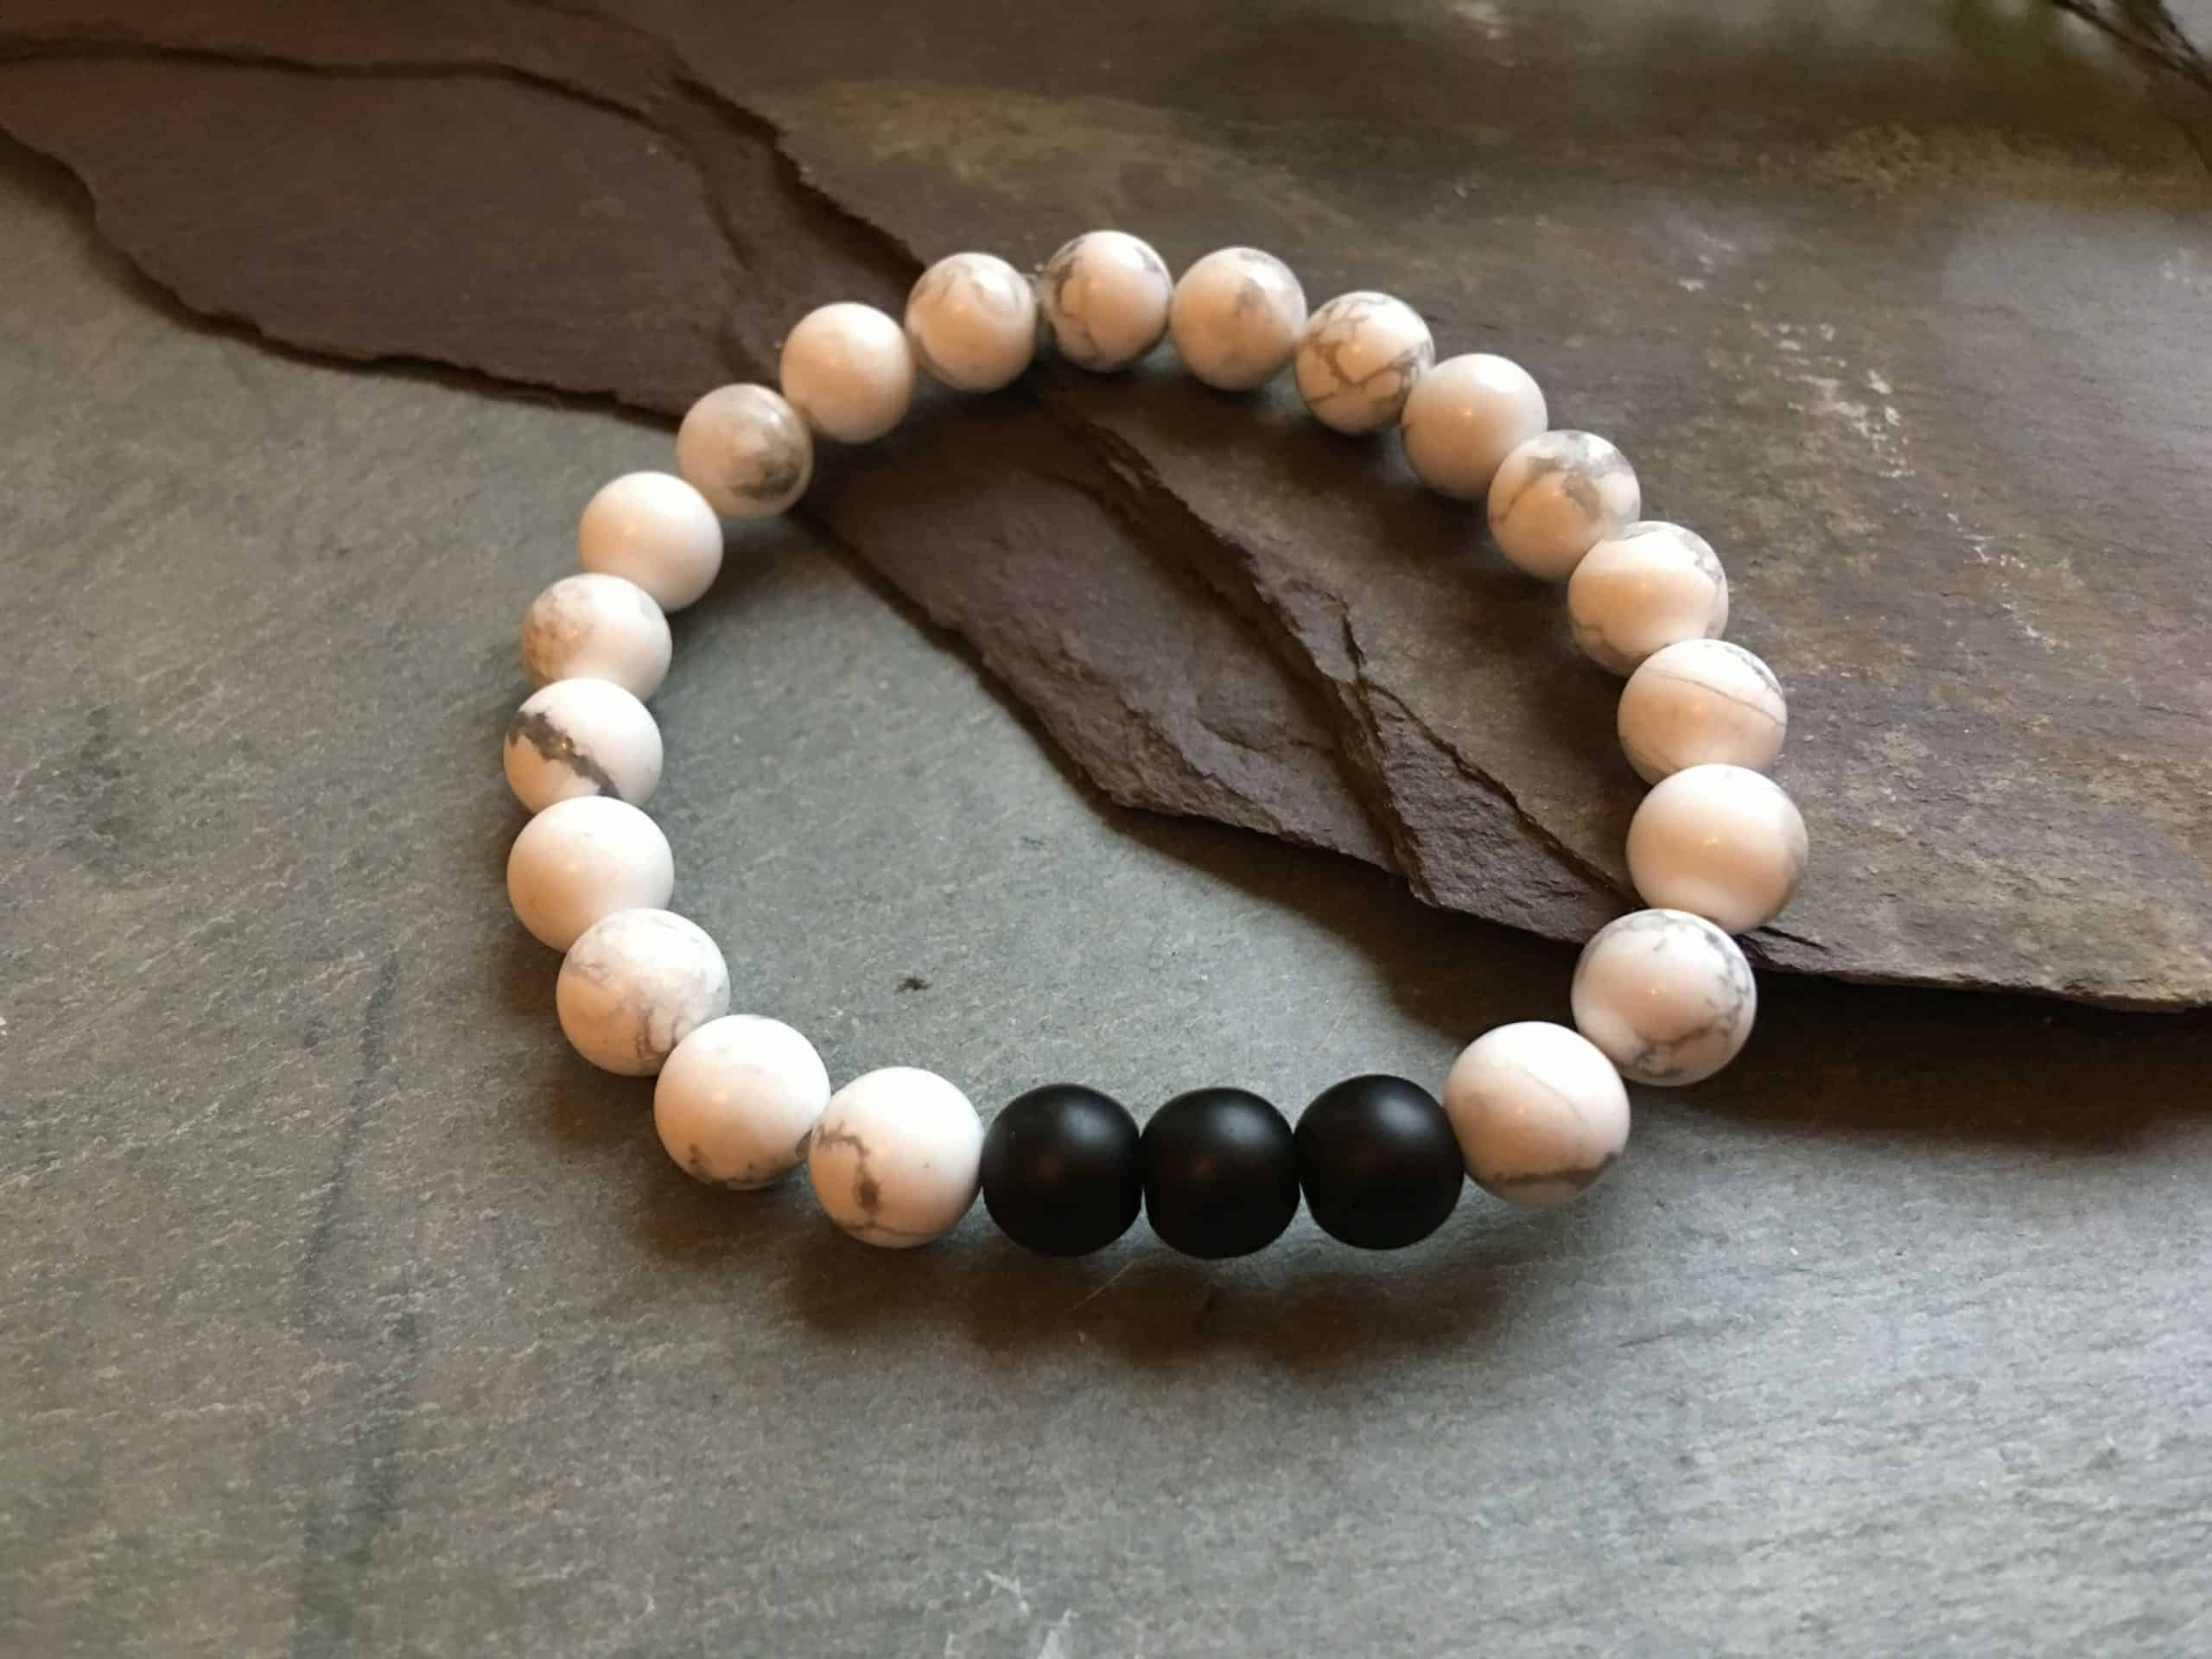 White Howlite and Matte Black Onyx Stone Bead Bracelet